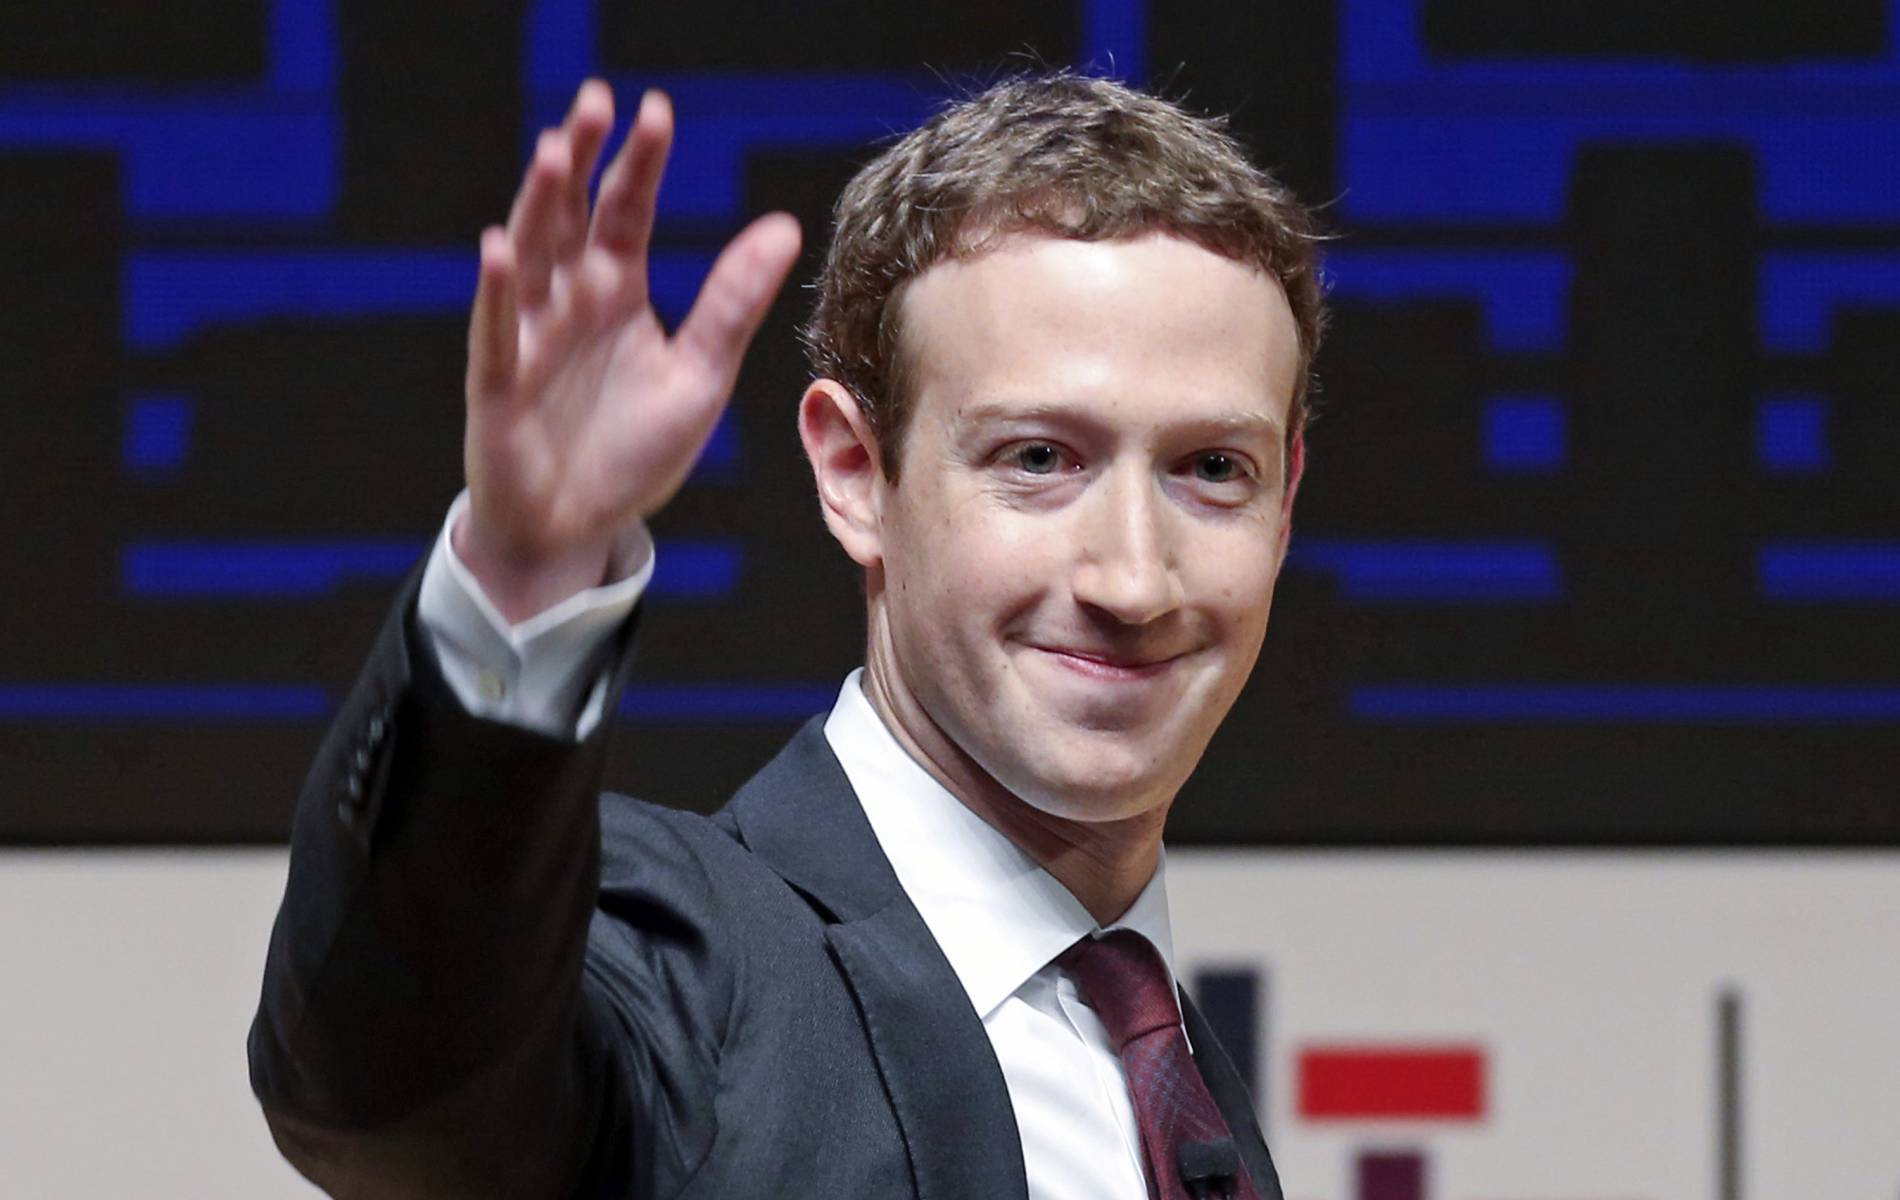 Марк Цукерберг пообещал телепортацию к 2030 году